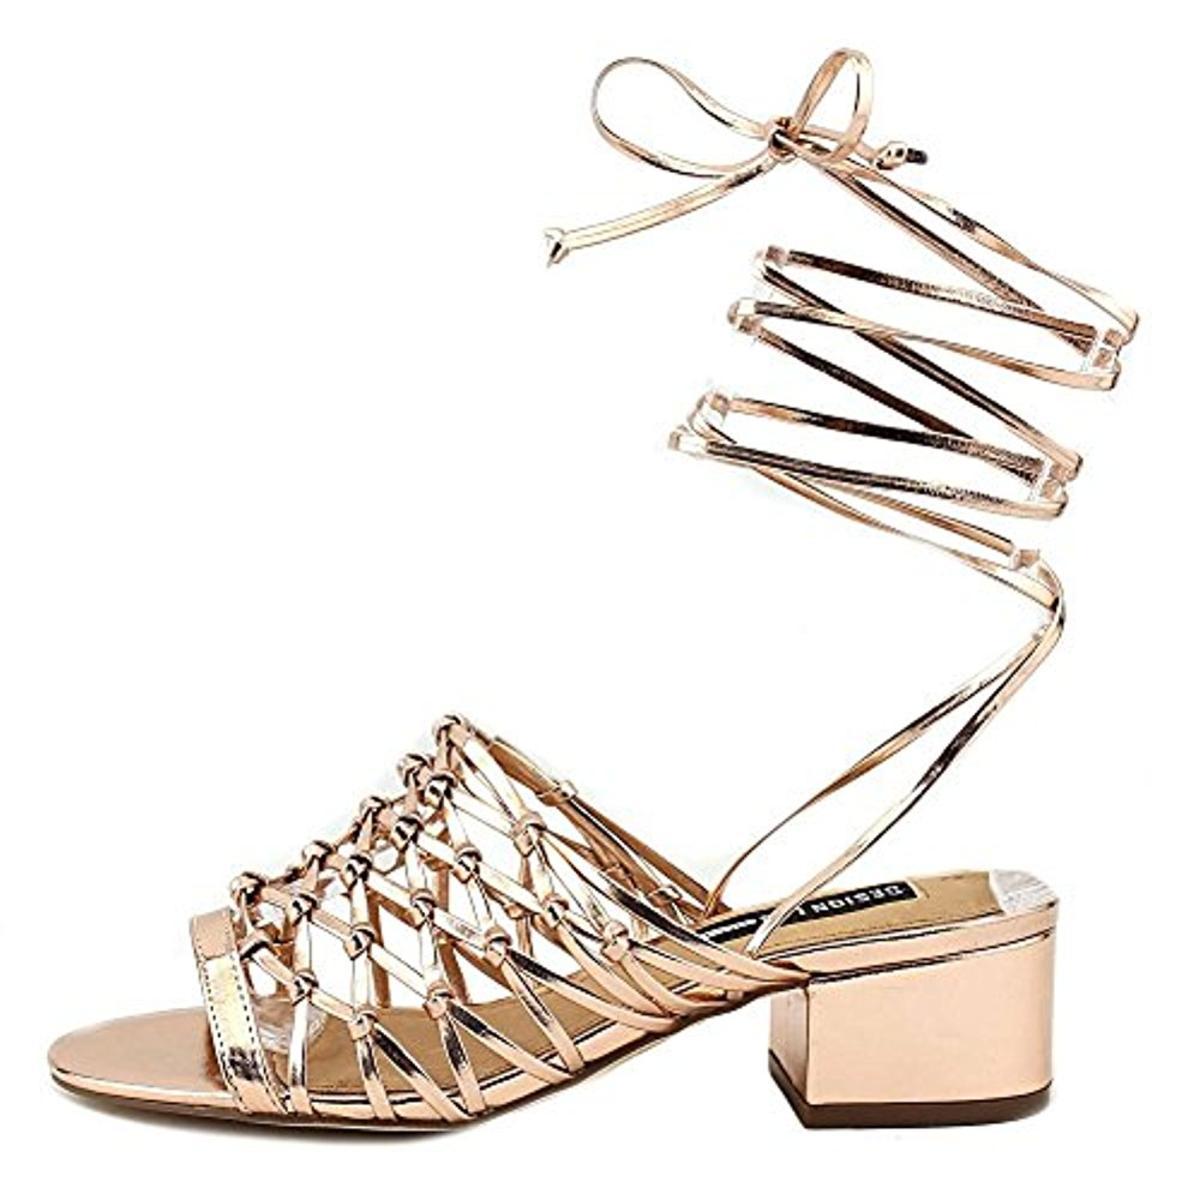 Design-Lab-Womens-Mya-Wrap-Open-Toe-Dress-Heels-Shoes-BHFO-2941 thumbnail 12